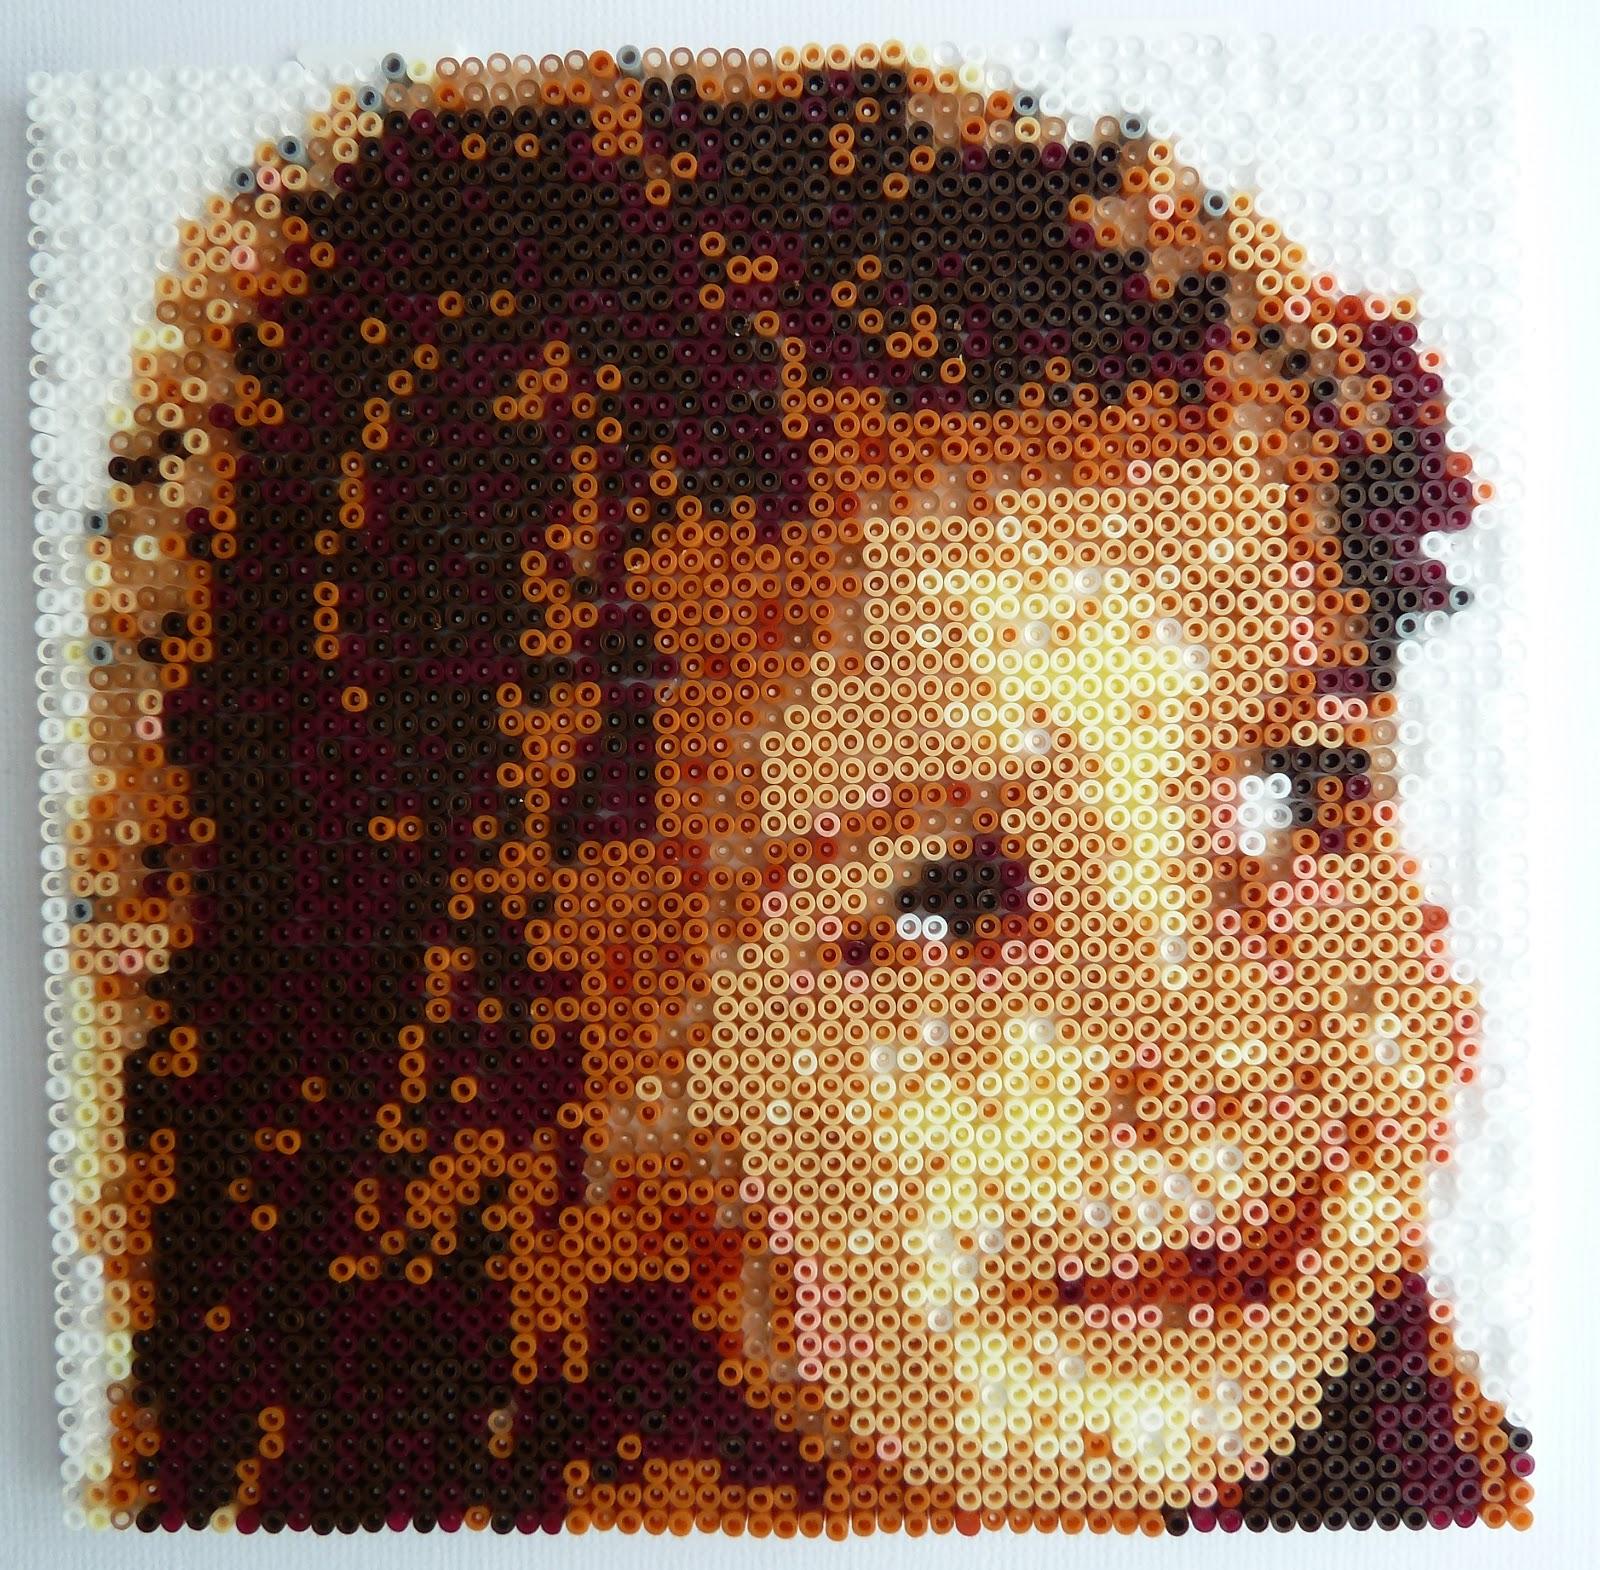 hama bead portrait 250 easy ways to get crafty with